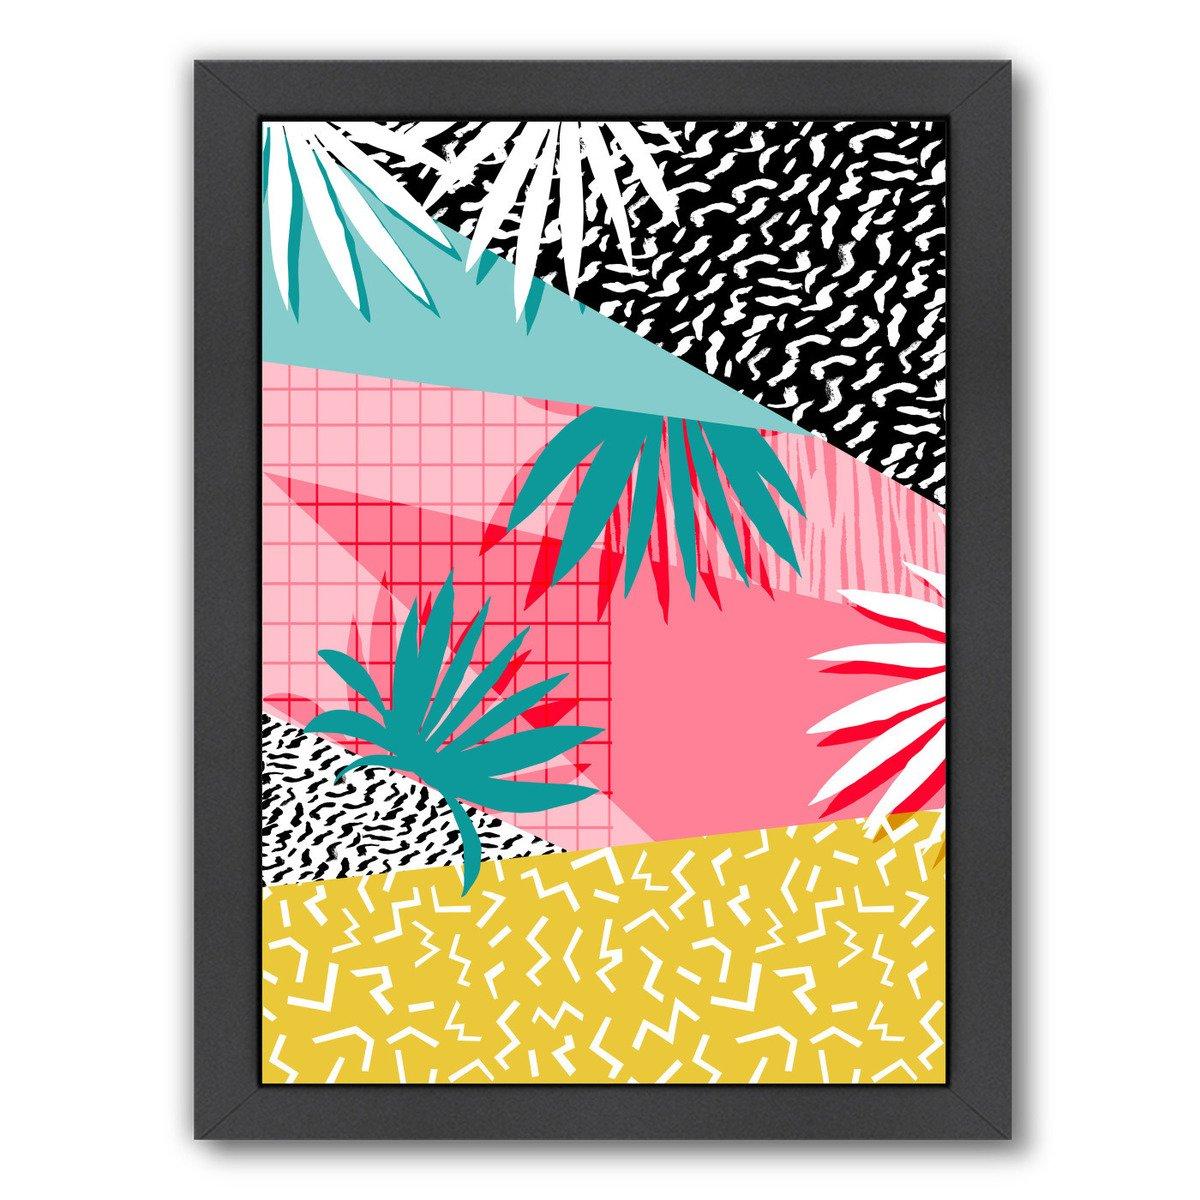 Americanflat Bingo Black Frame Print by Wacka Designs, 12'' H x 15'' W x 1'' D by Americanflat